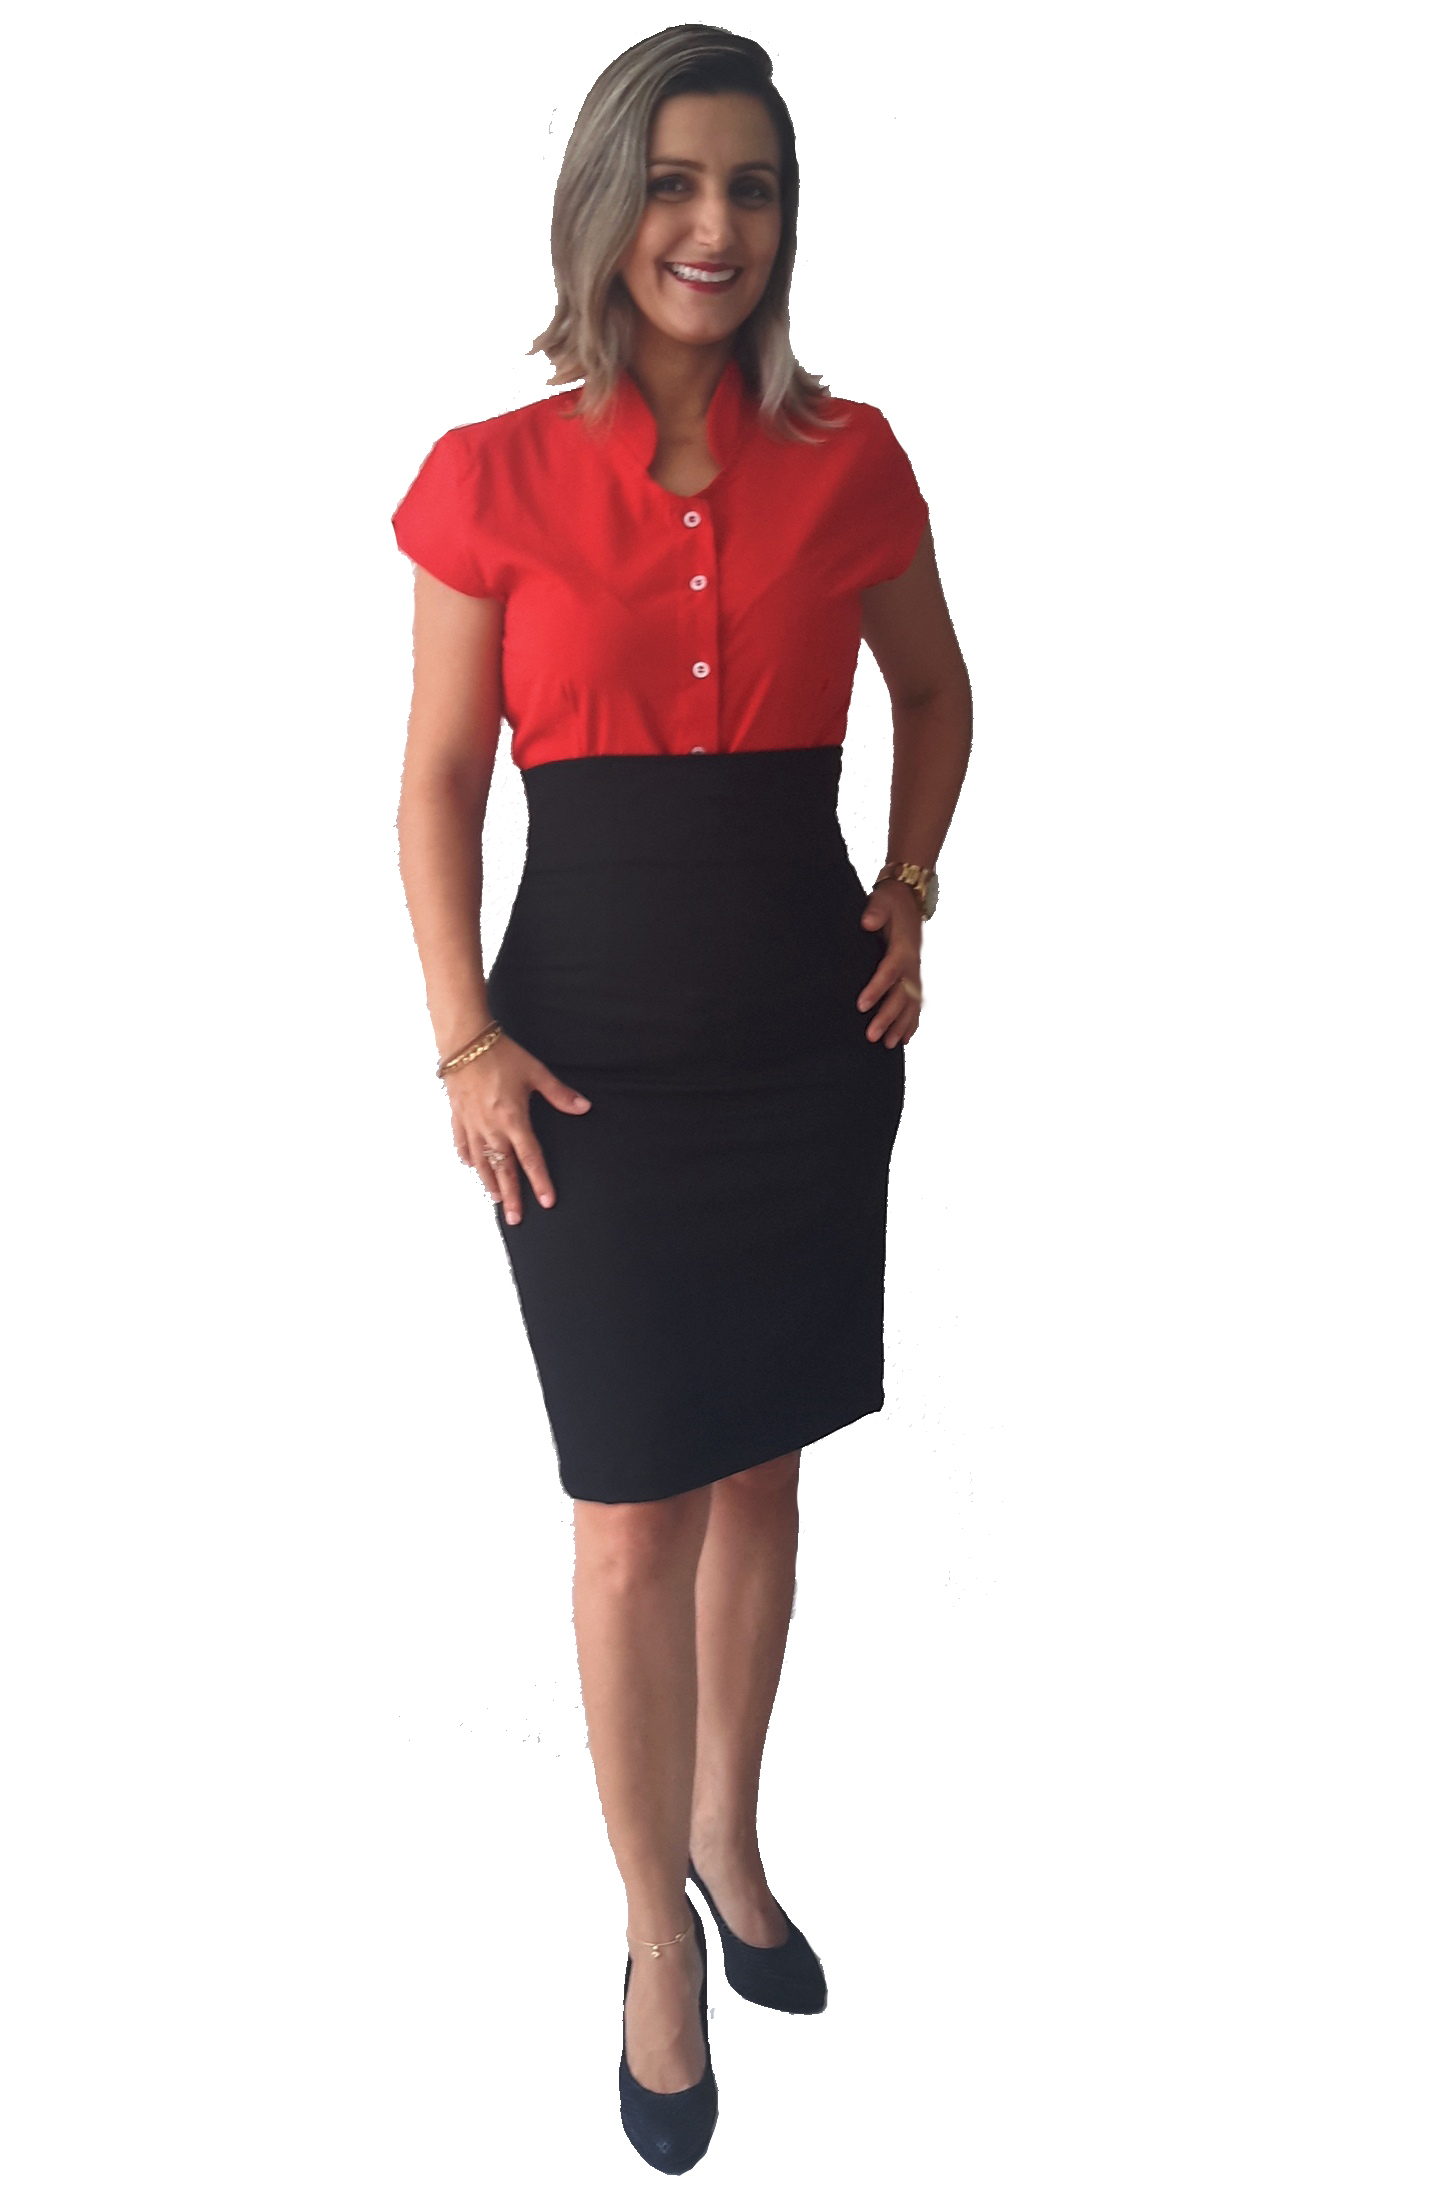 camisa-feminina-para-uniformes-sorocaba-4